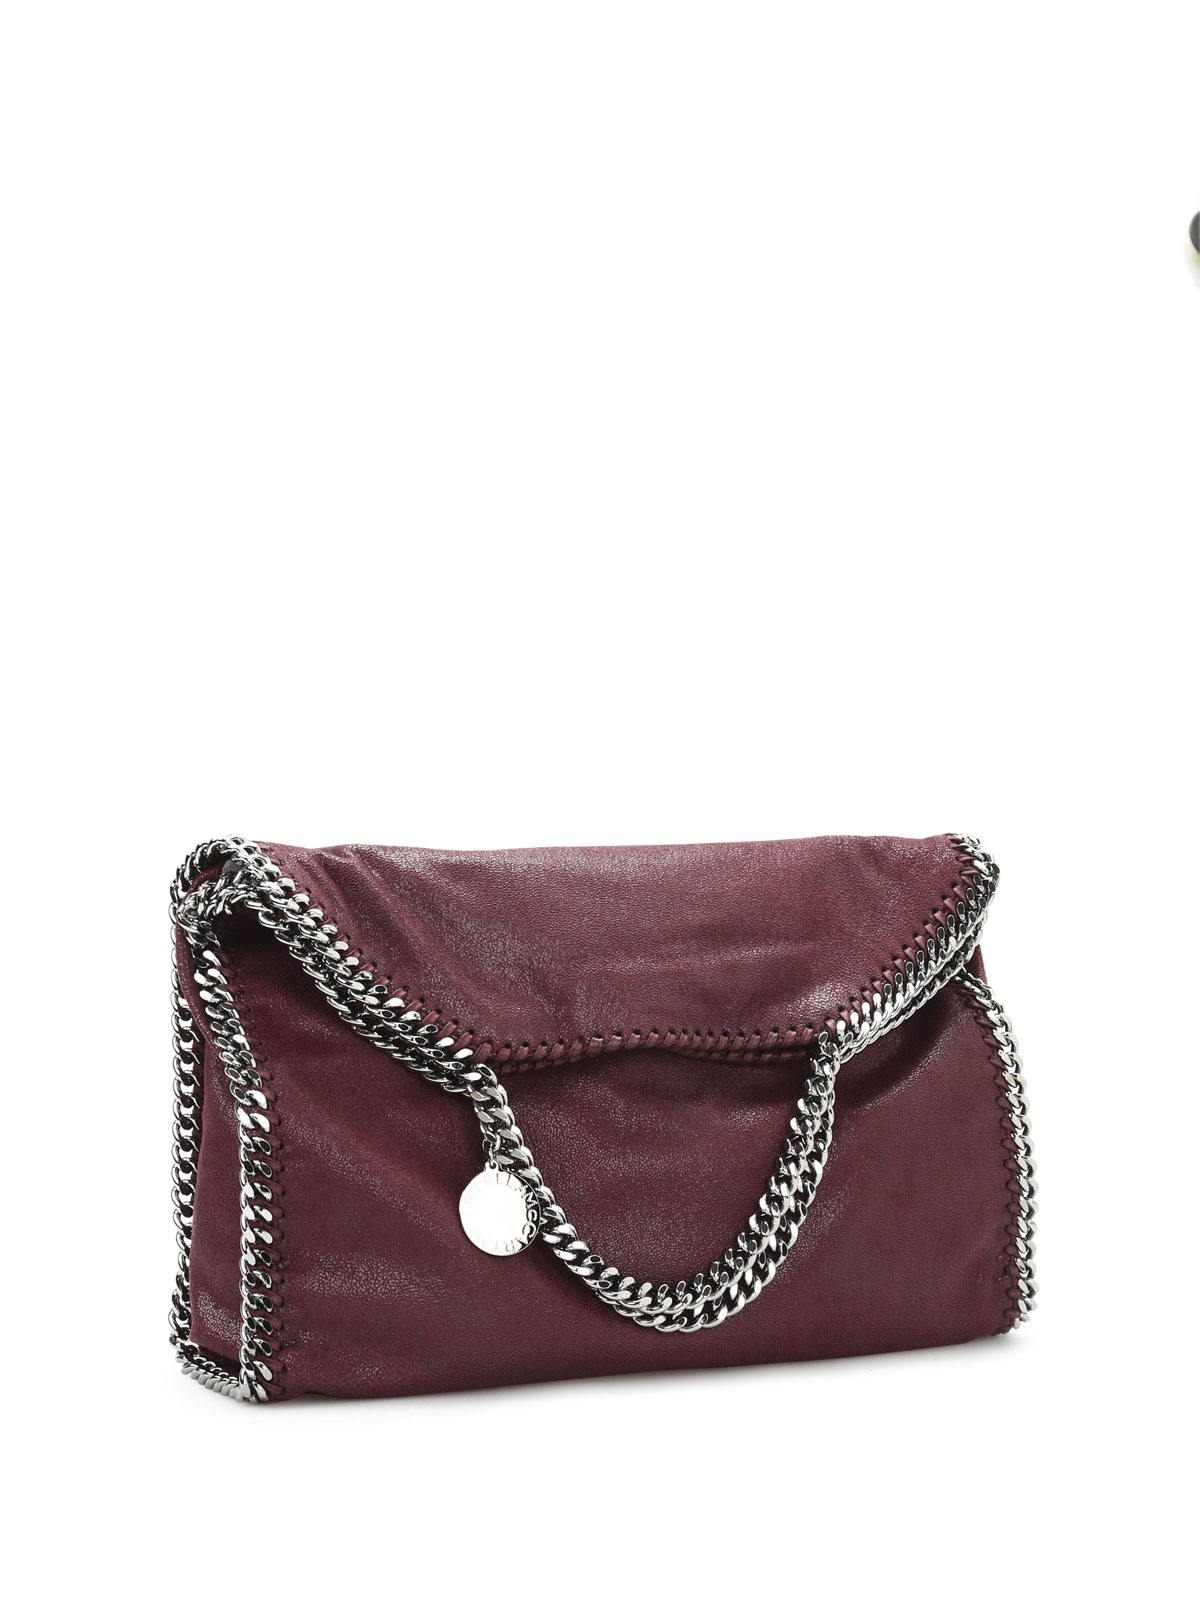 727d158dac3d Stella Mccartney - Falabella tote - totes bags - 234387W9132 6110